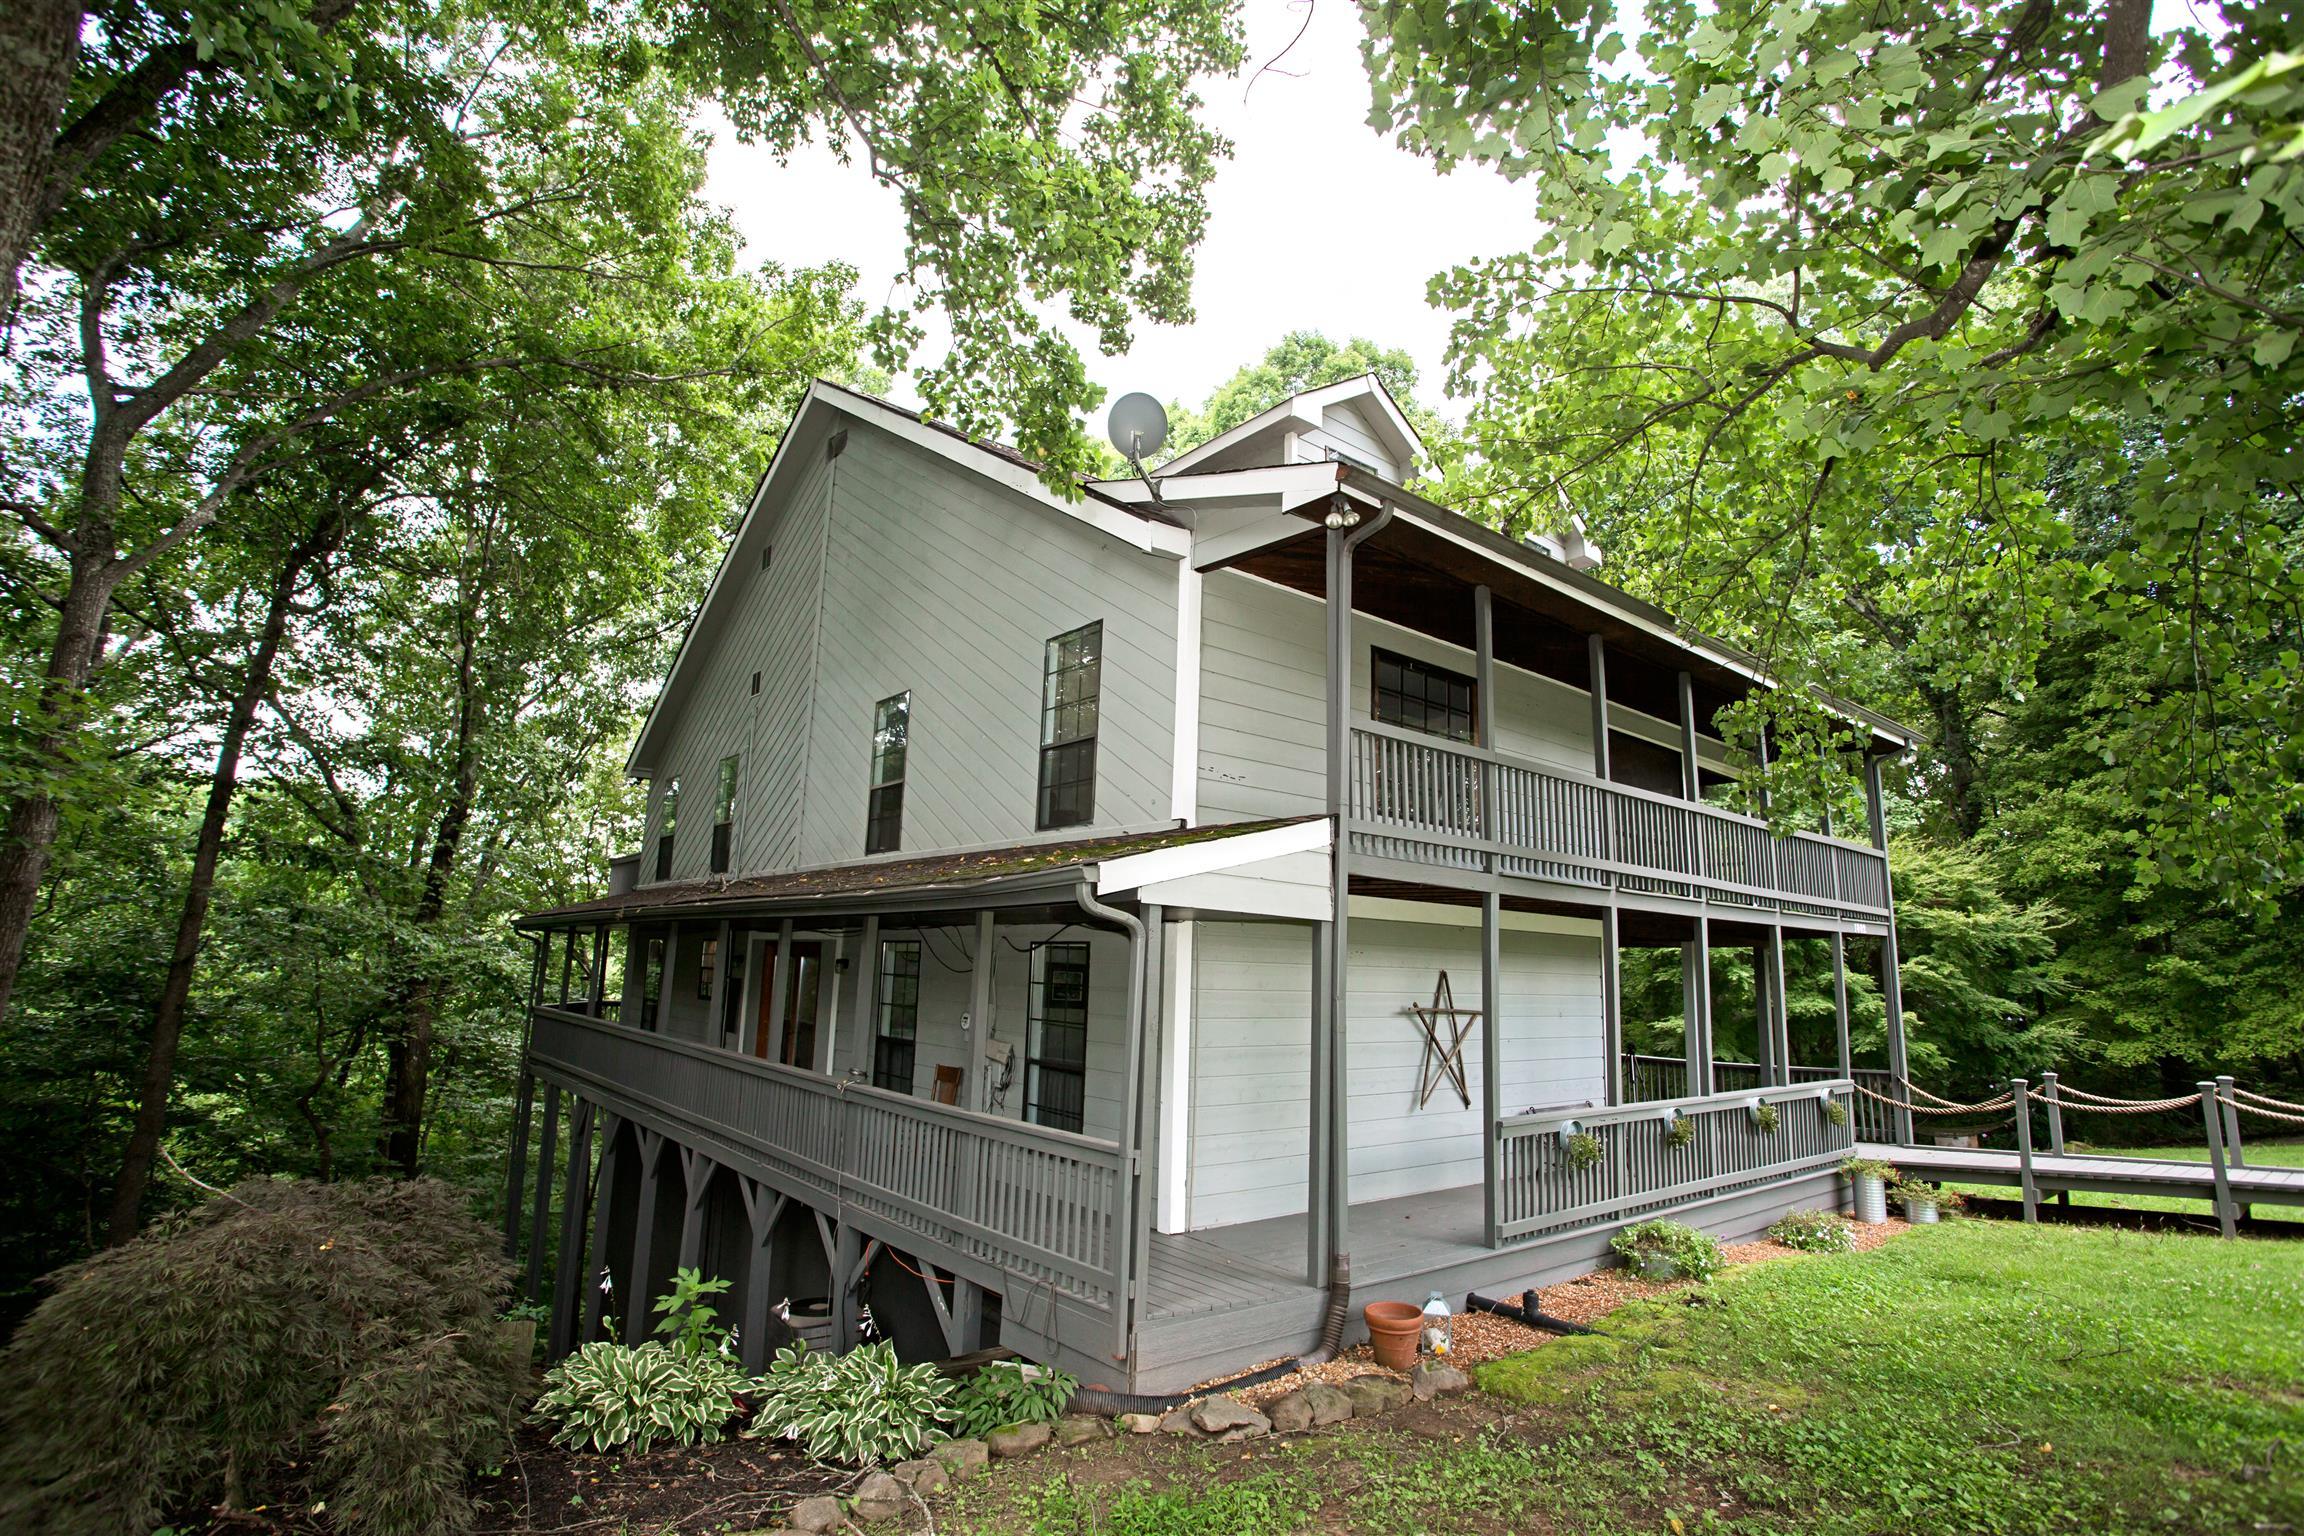 4215 Edgar Dillard Rd, Greenbrier, TN 37073 - Greenbrier, TN real estate listing